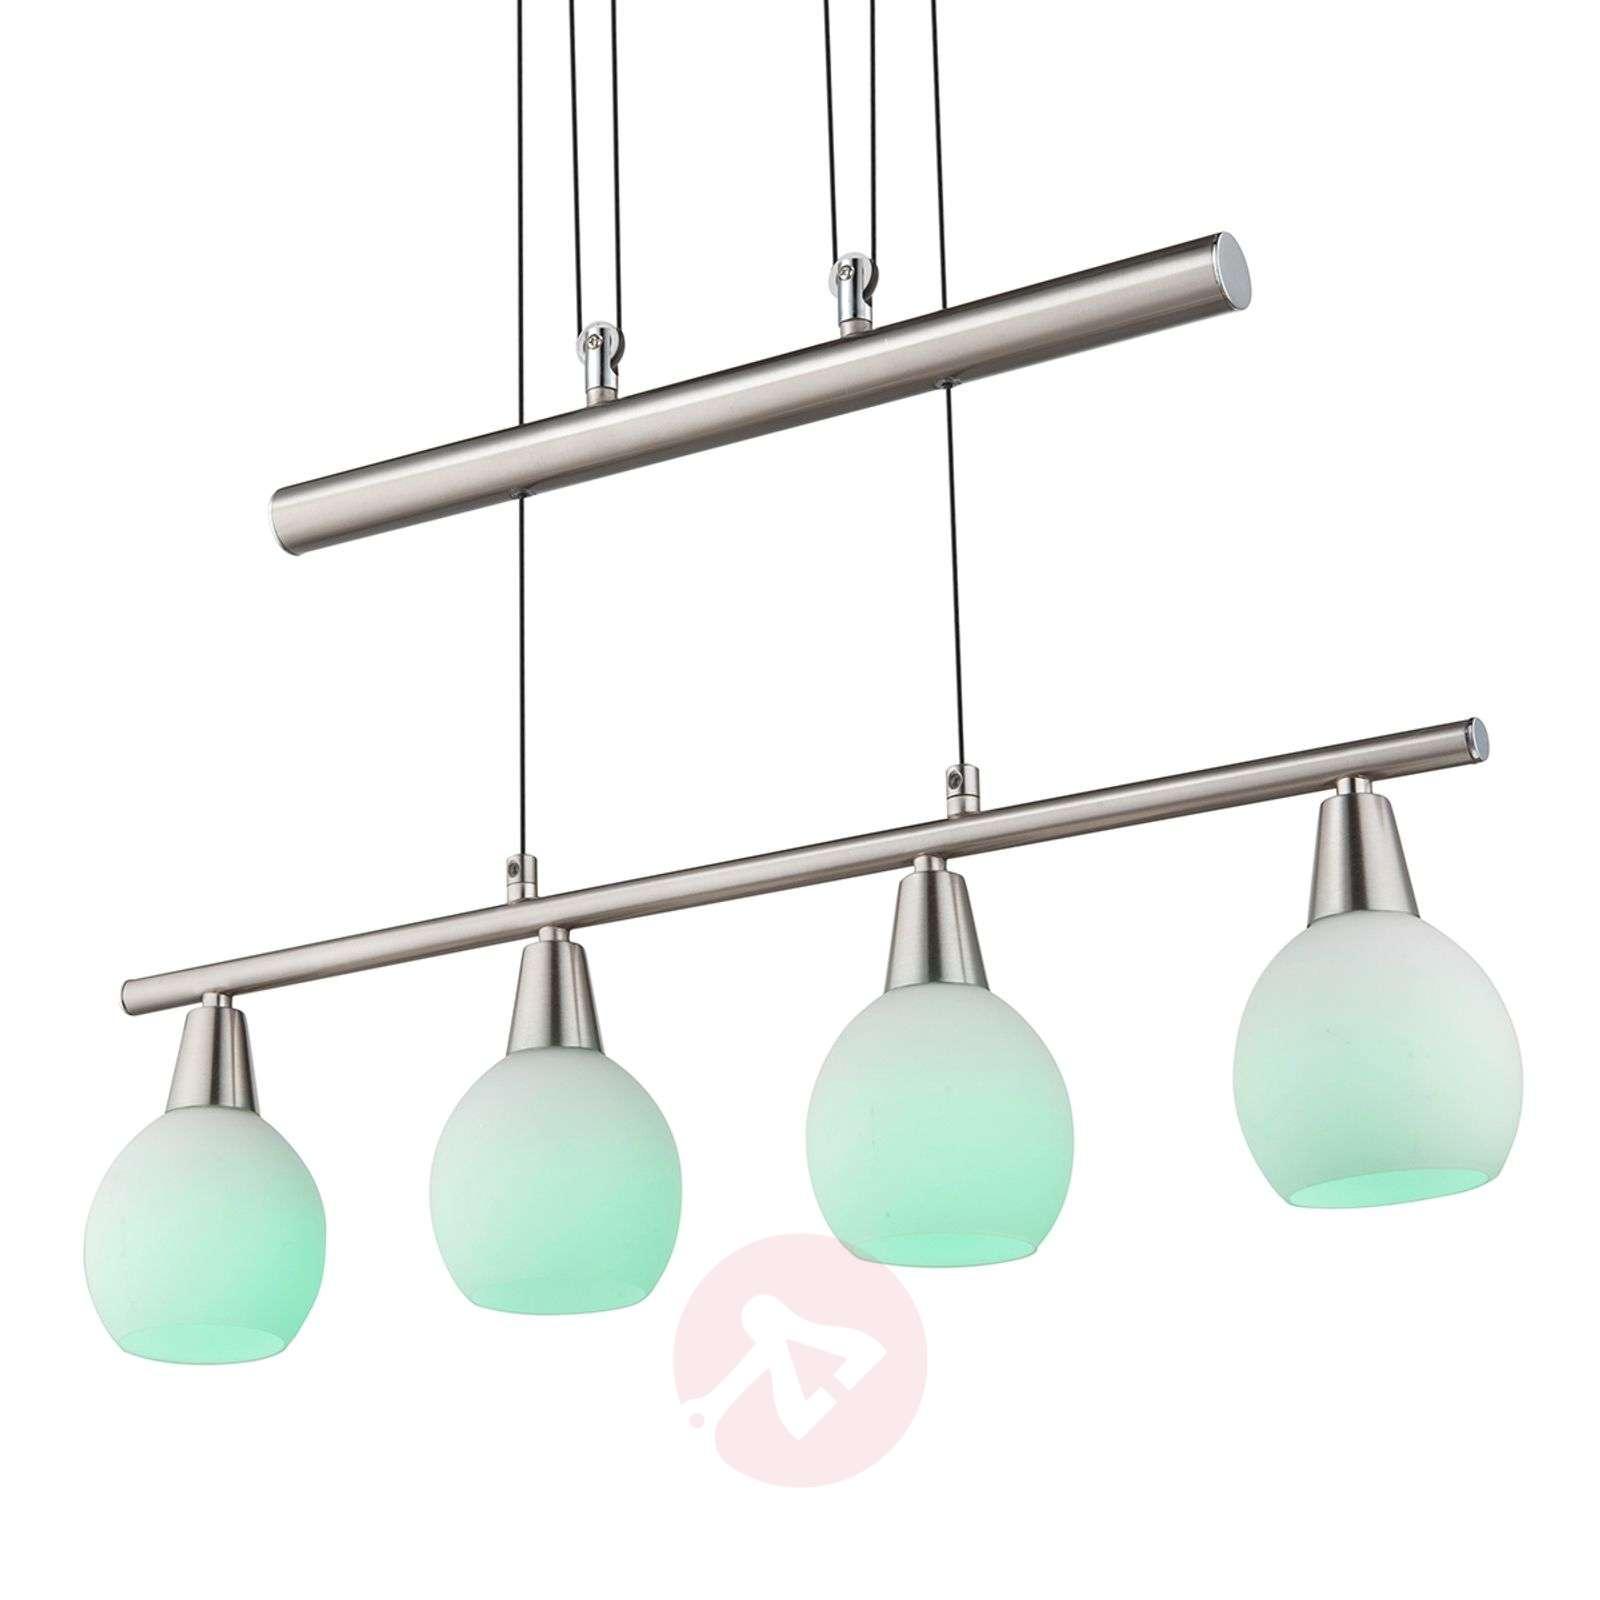 Colourful LED pendant lamp Kaiden-4014883-01